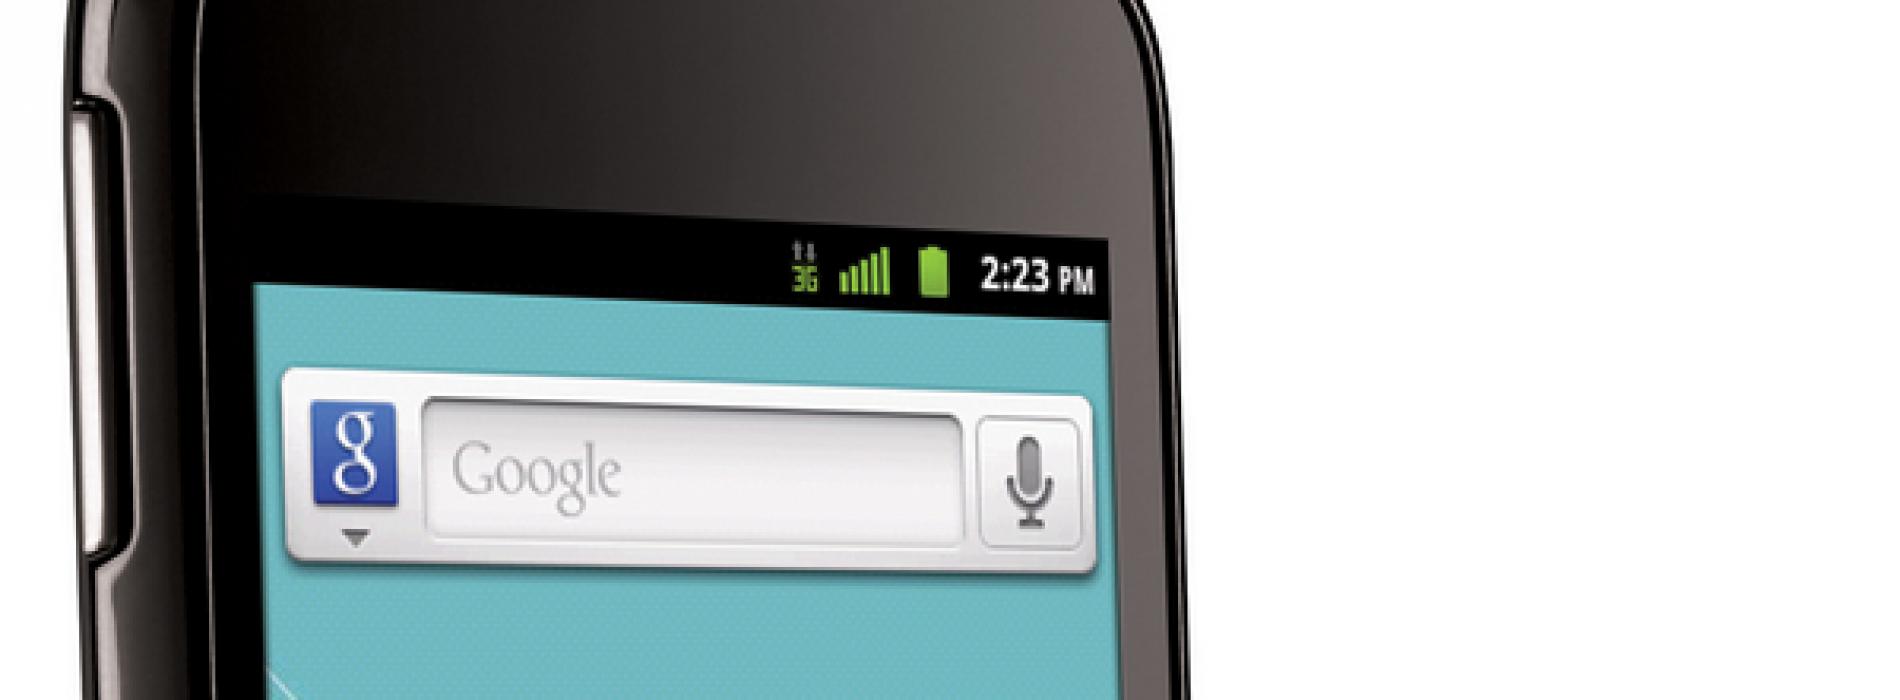 U.S. Cellular set to offer Huawei Ascend II next week